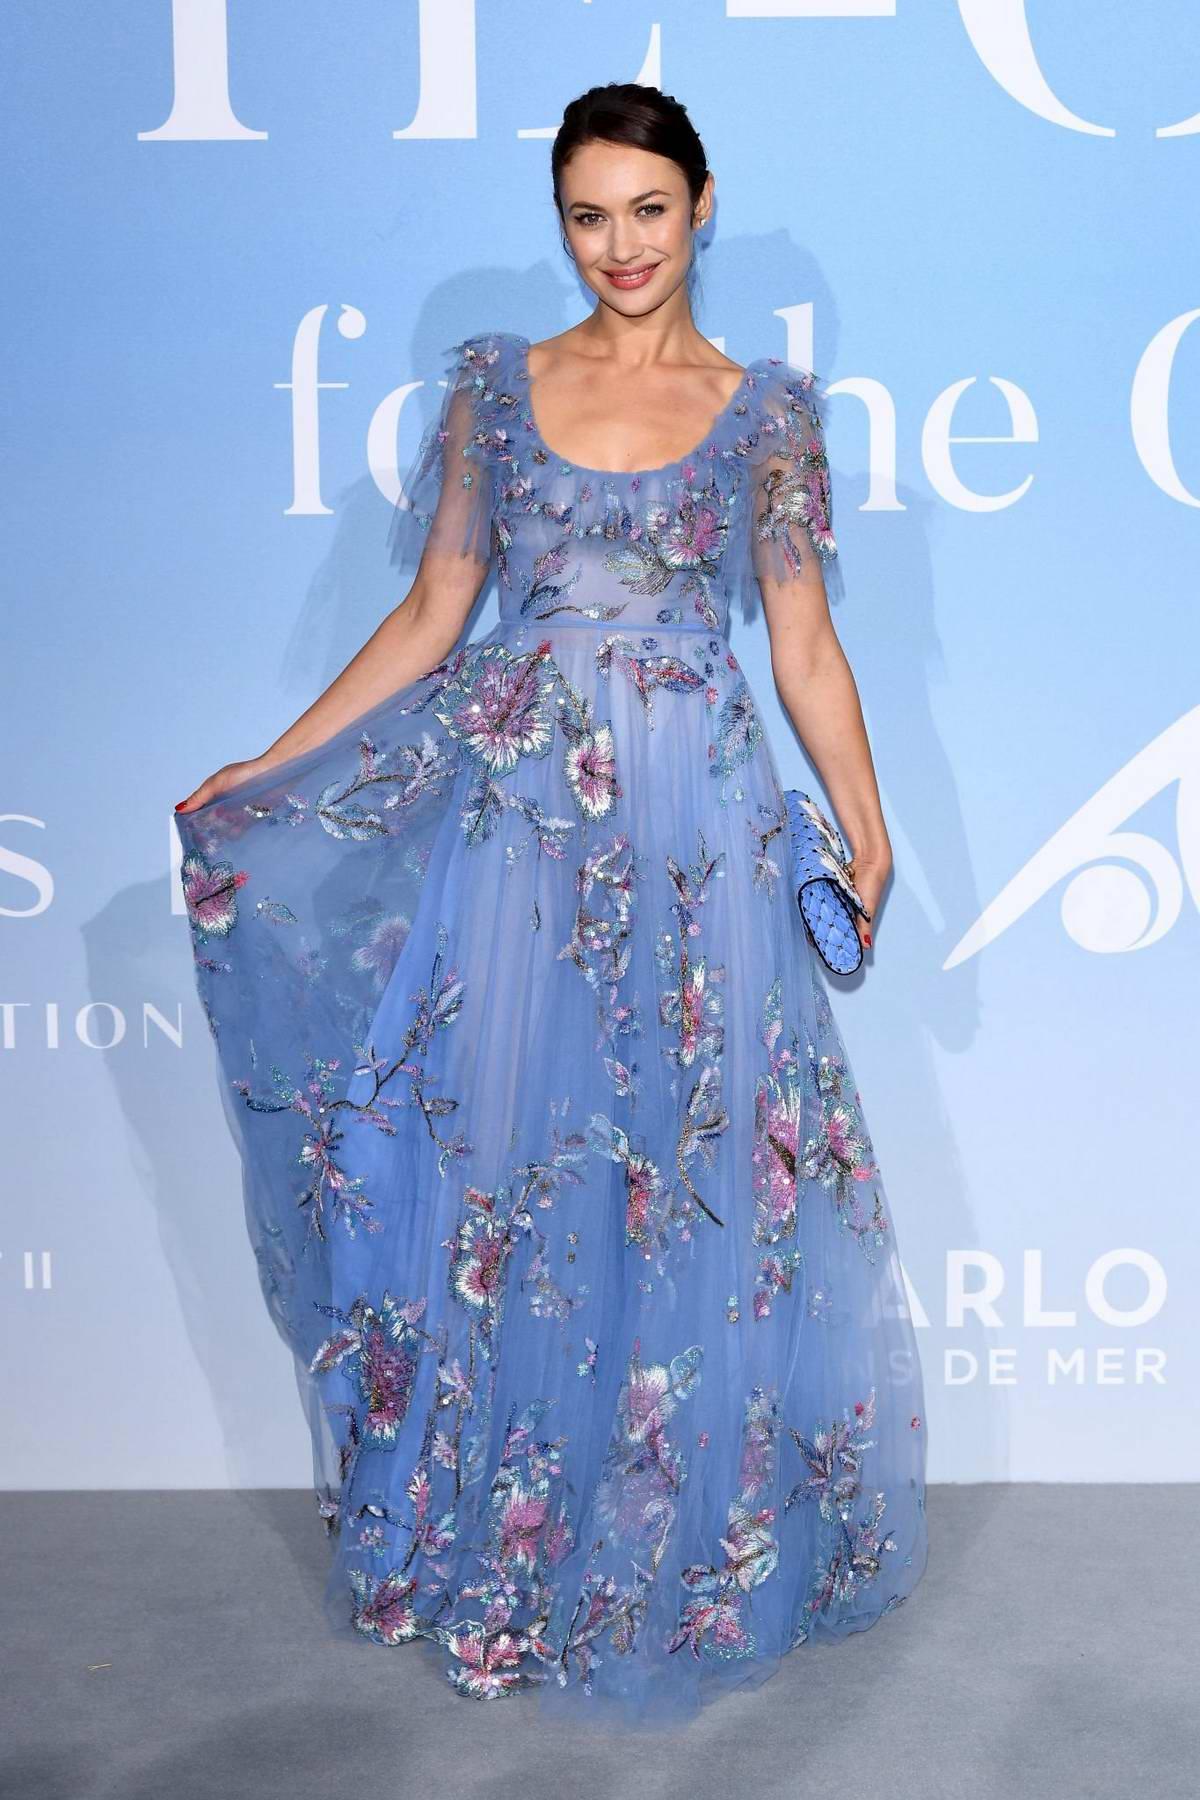 Olga Kurylenko attends the Gala For The Global Ocean in Monte Carlo, Monaco